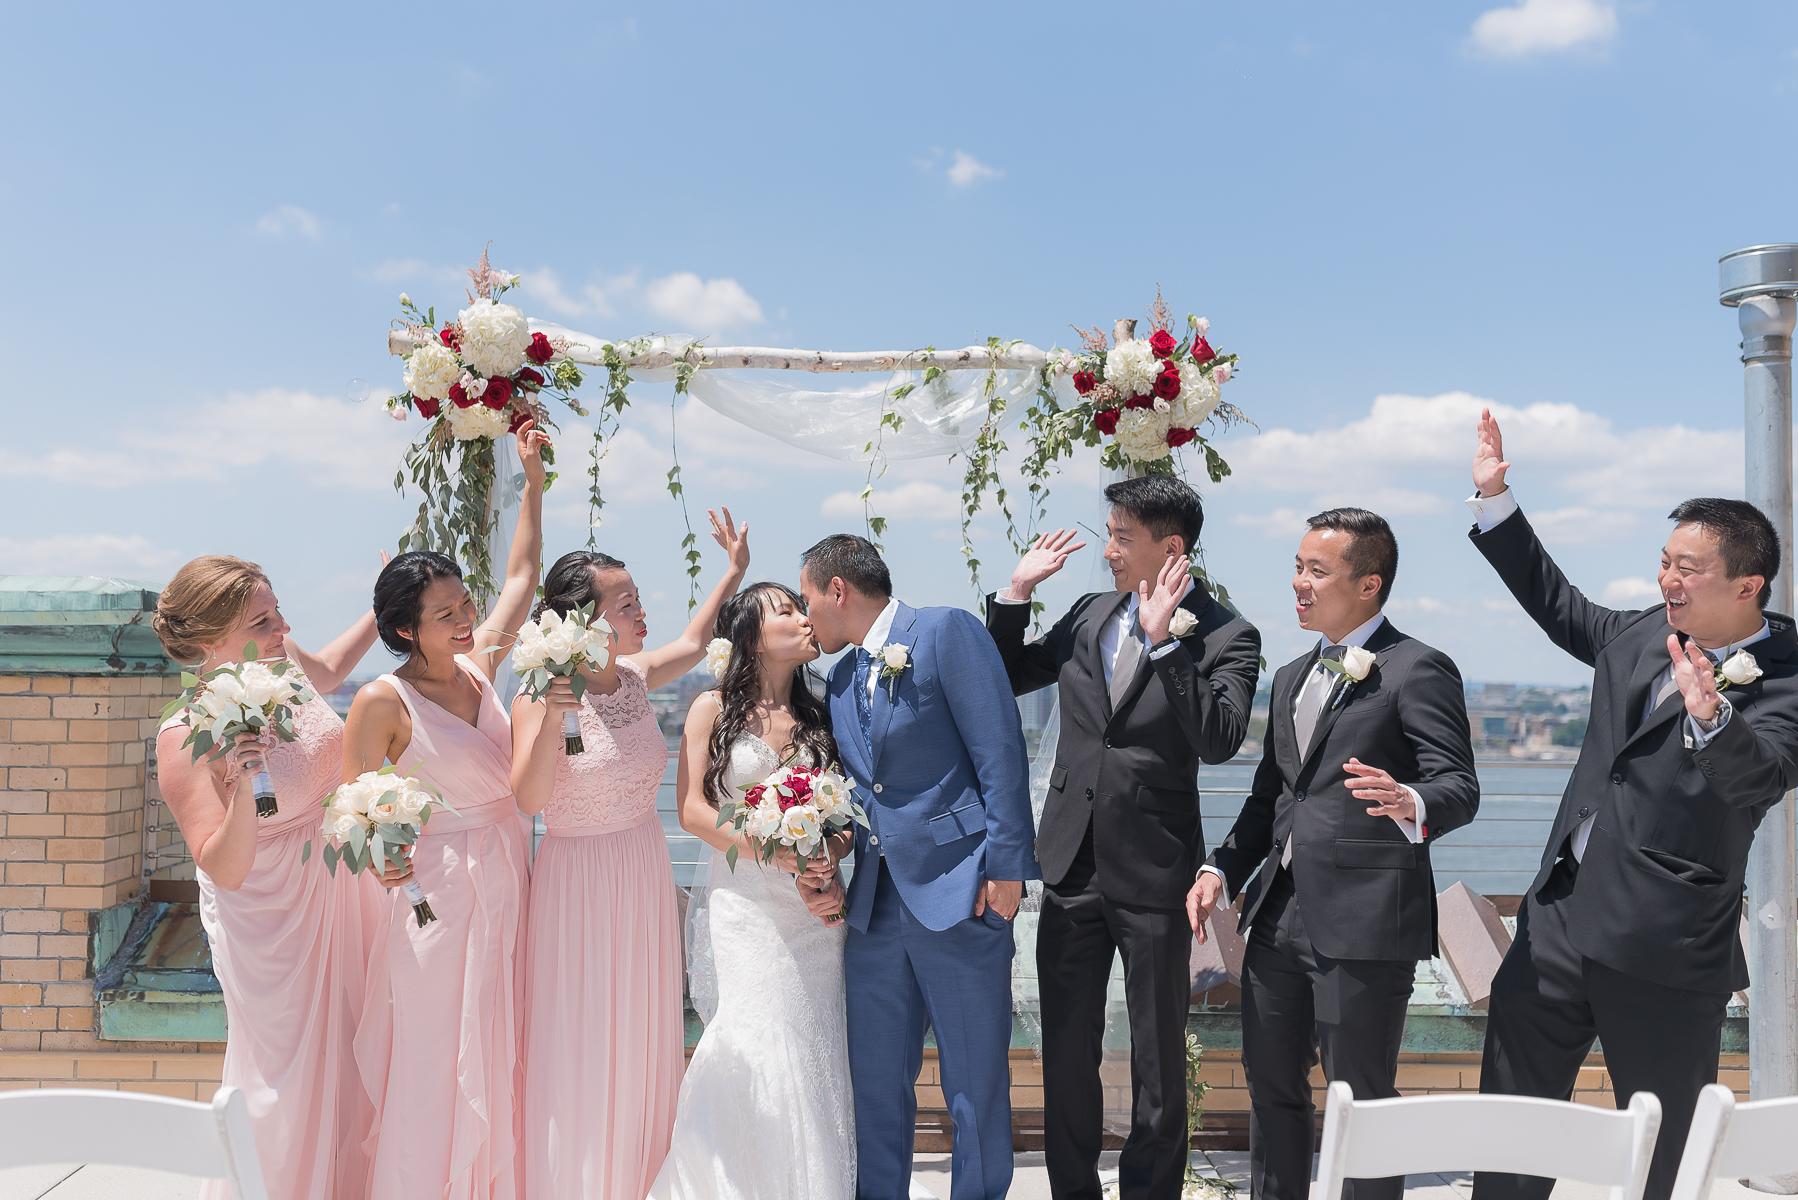 NYC-Ramscale-Wedding-Ceremony-Wedding-Party.jpg